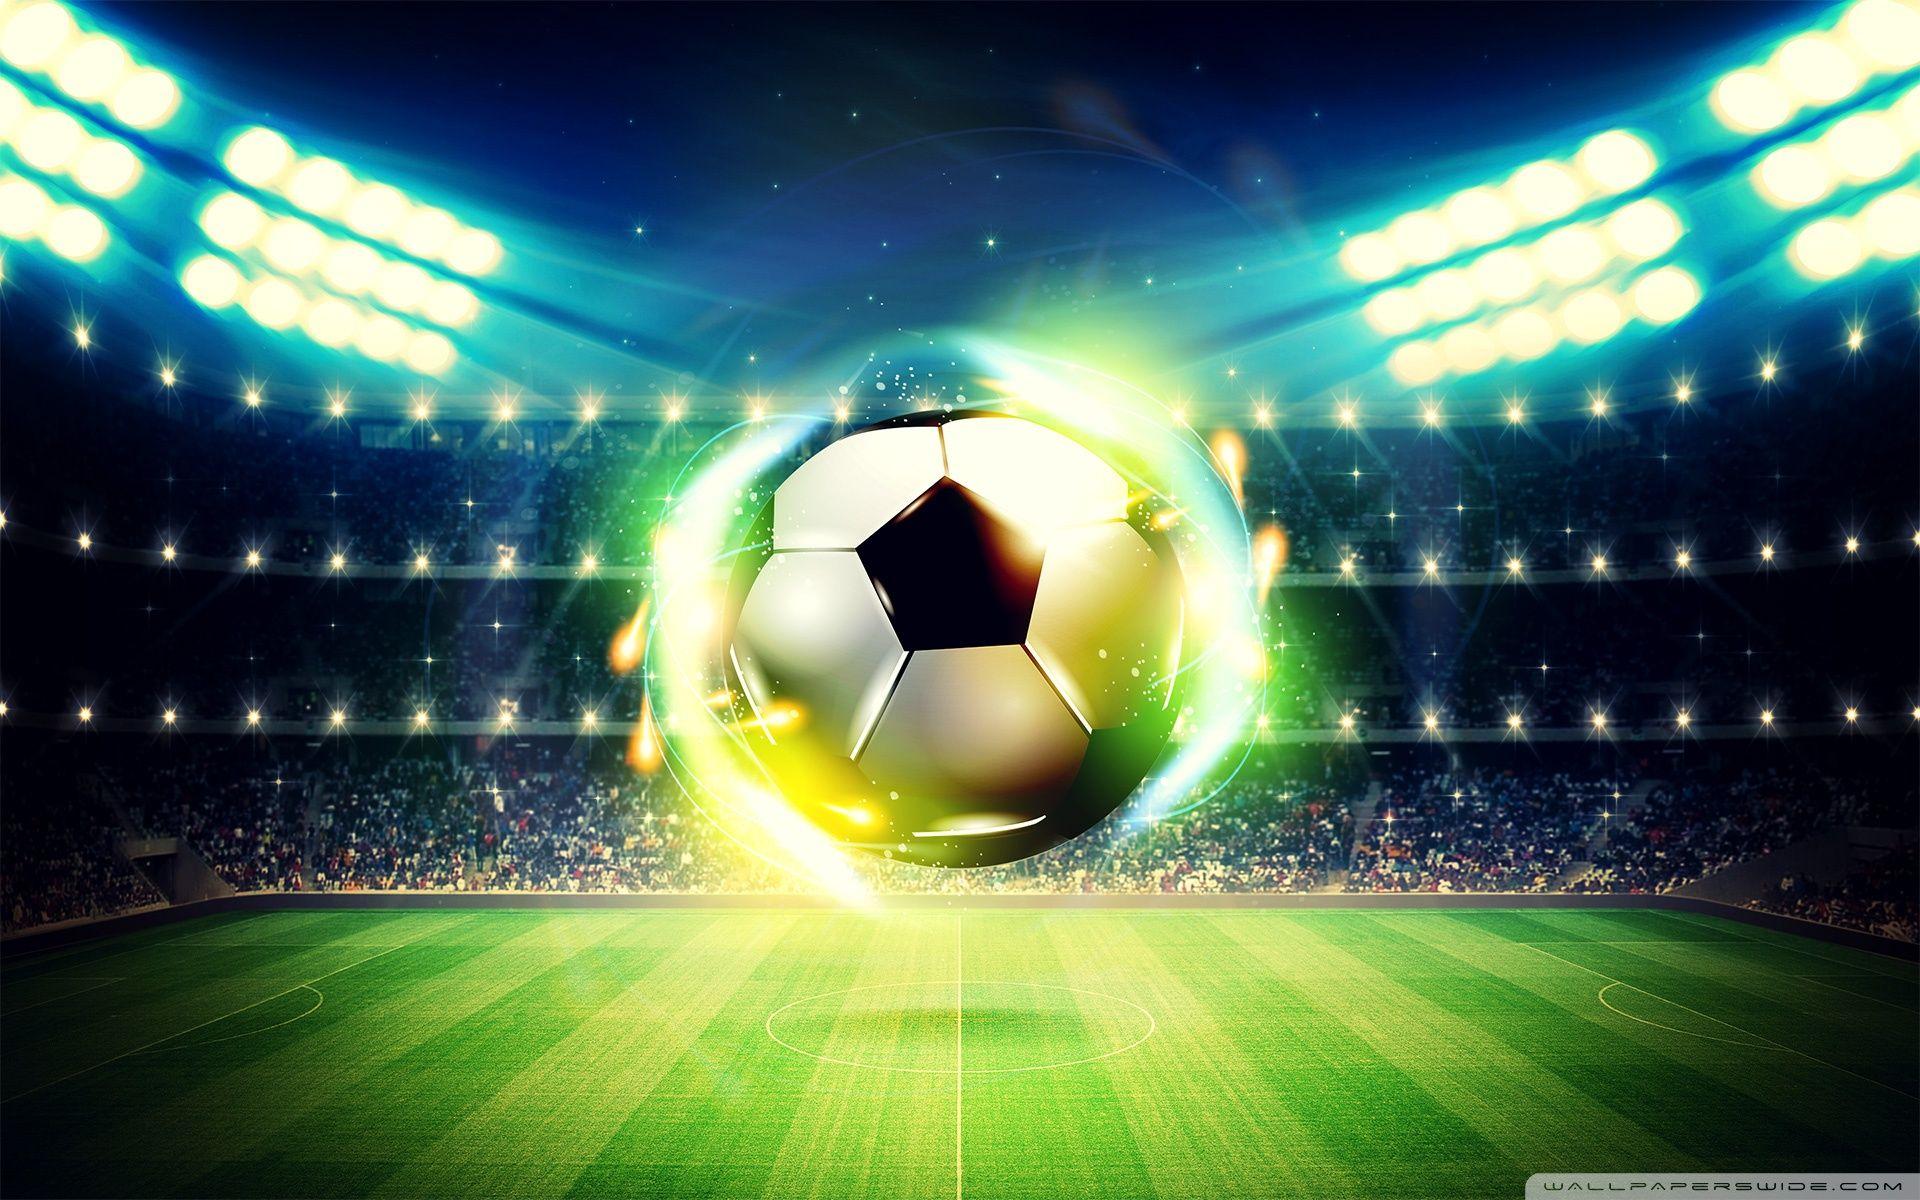 Most Inspiring Wallpaper High Quality Football - db9fcf501bc03e7c30d7d37b460ff49d  Perfect Image Reference_639795.jpg